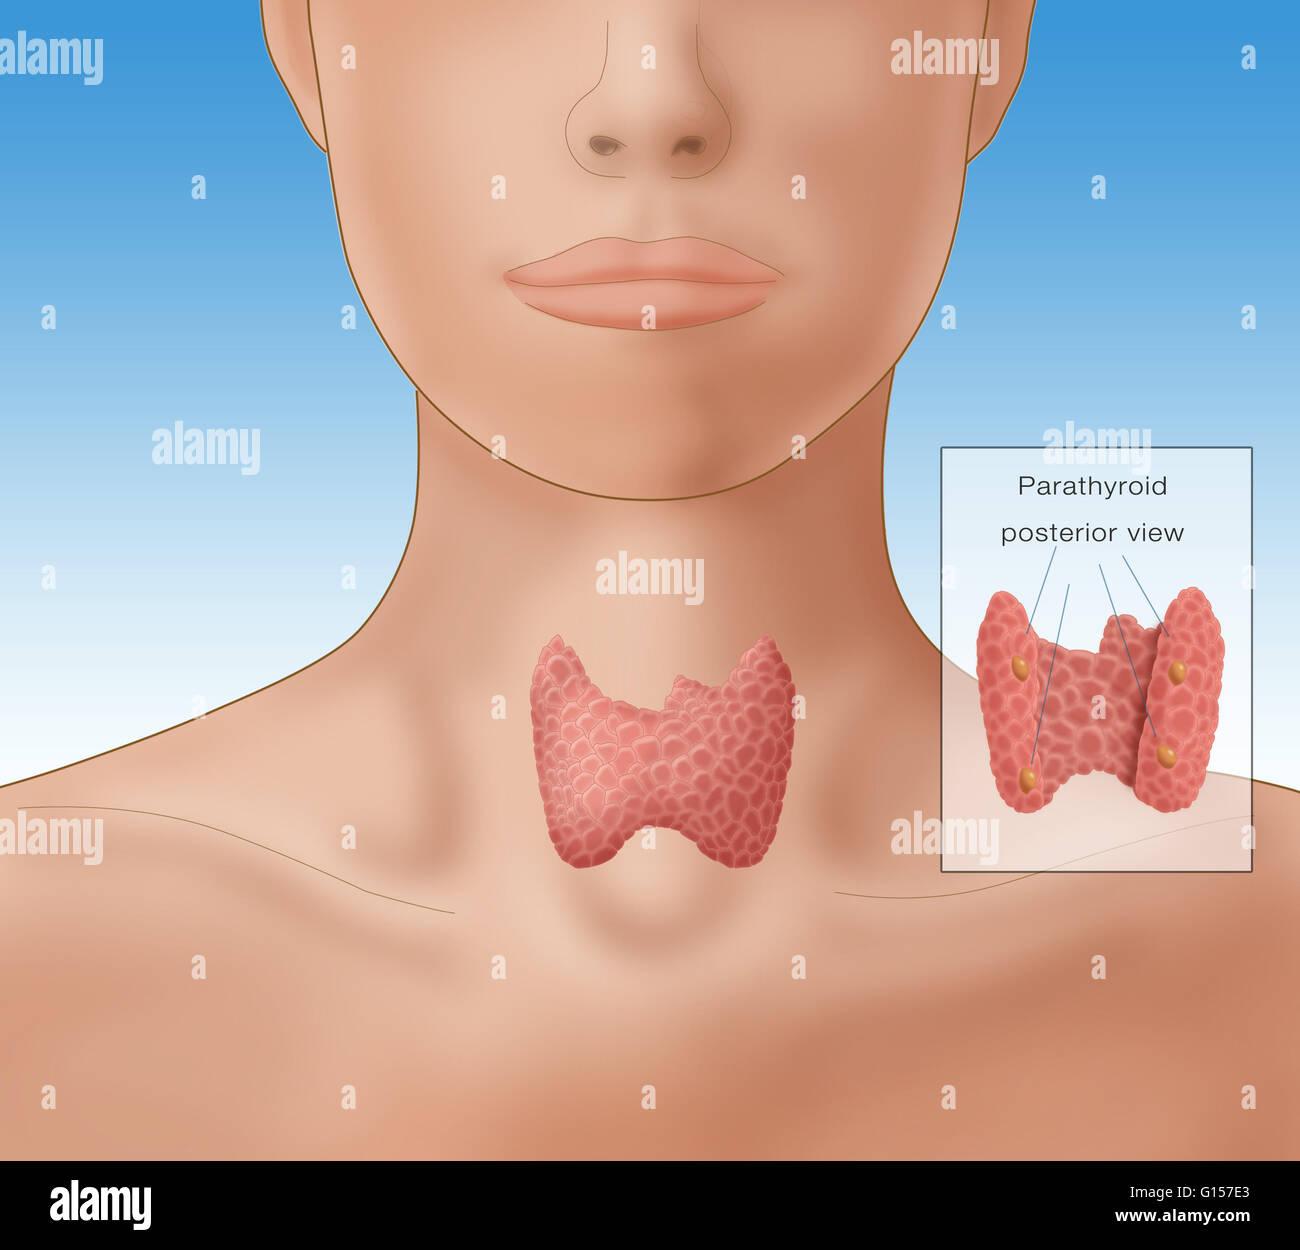 Female Endocrine System Imágenes De Stock & Female Endocrine System ...